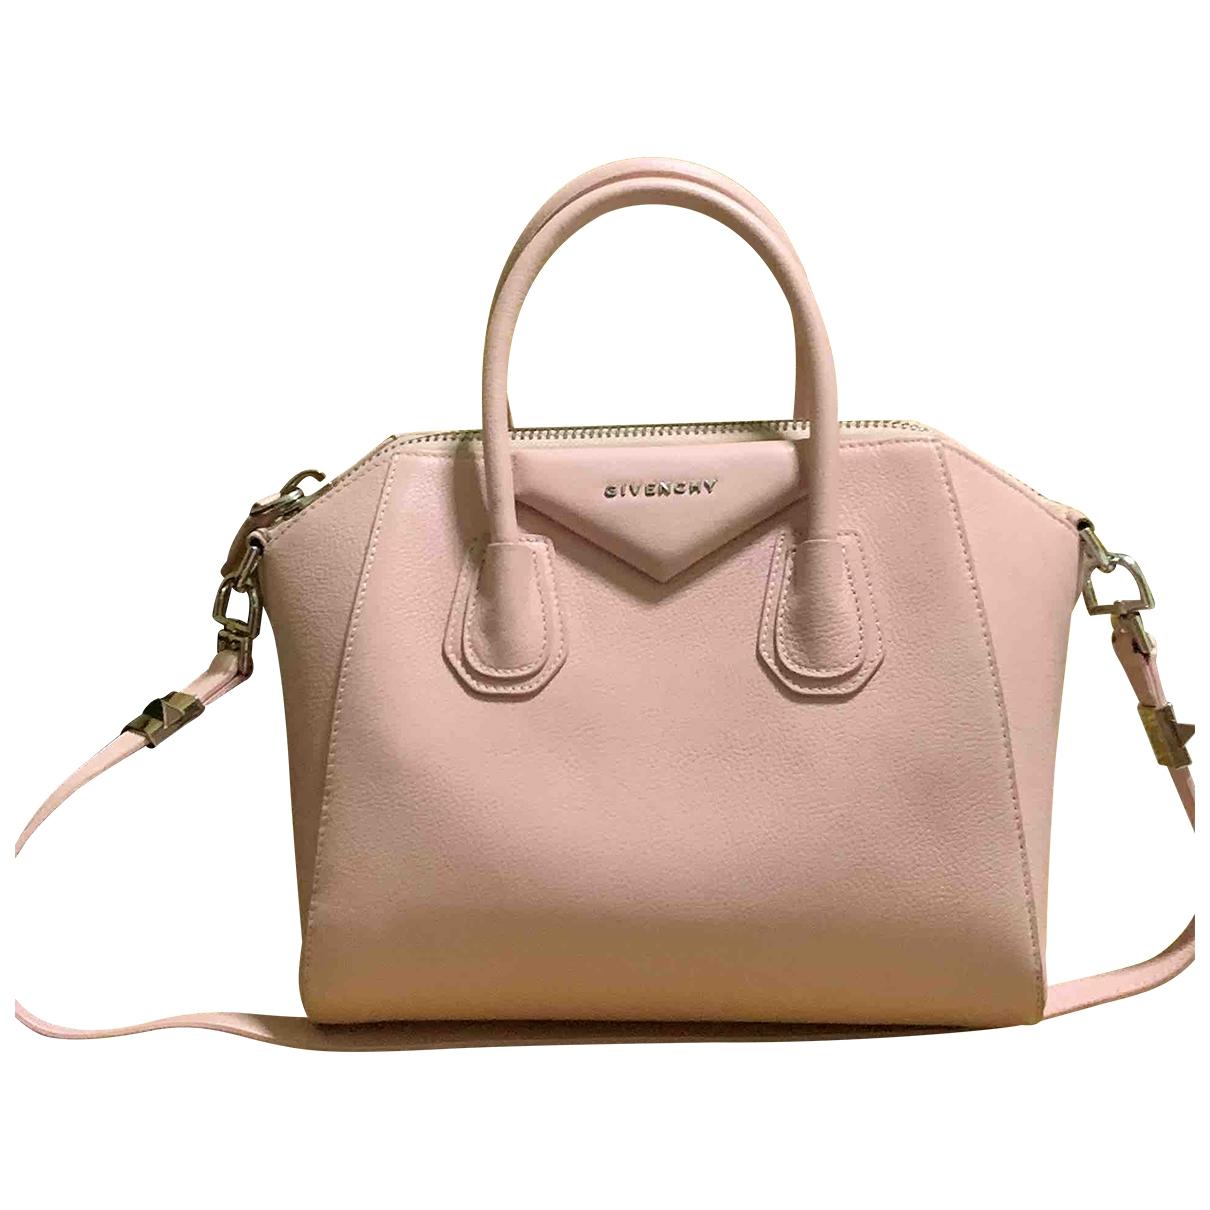 Givenchy - Sac a main Antigona pour femme en cuir